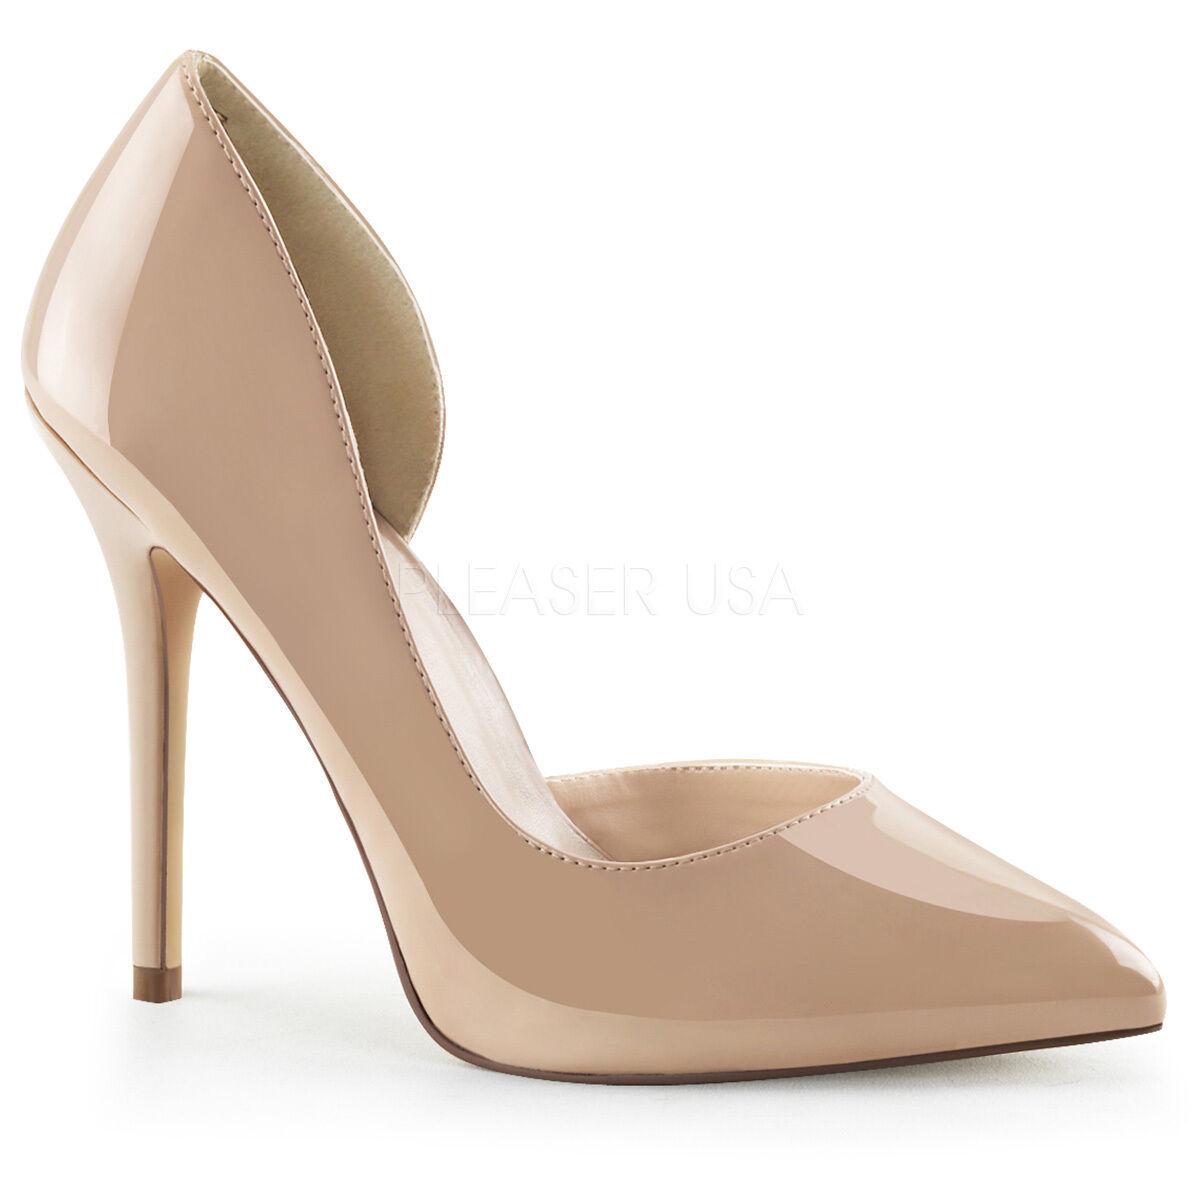 Gold 13 cm Pleaser AMUSE 13 high heeled sandals